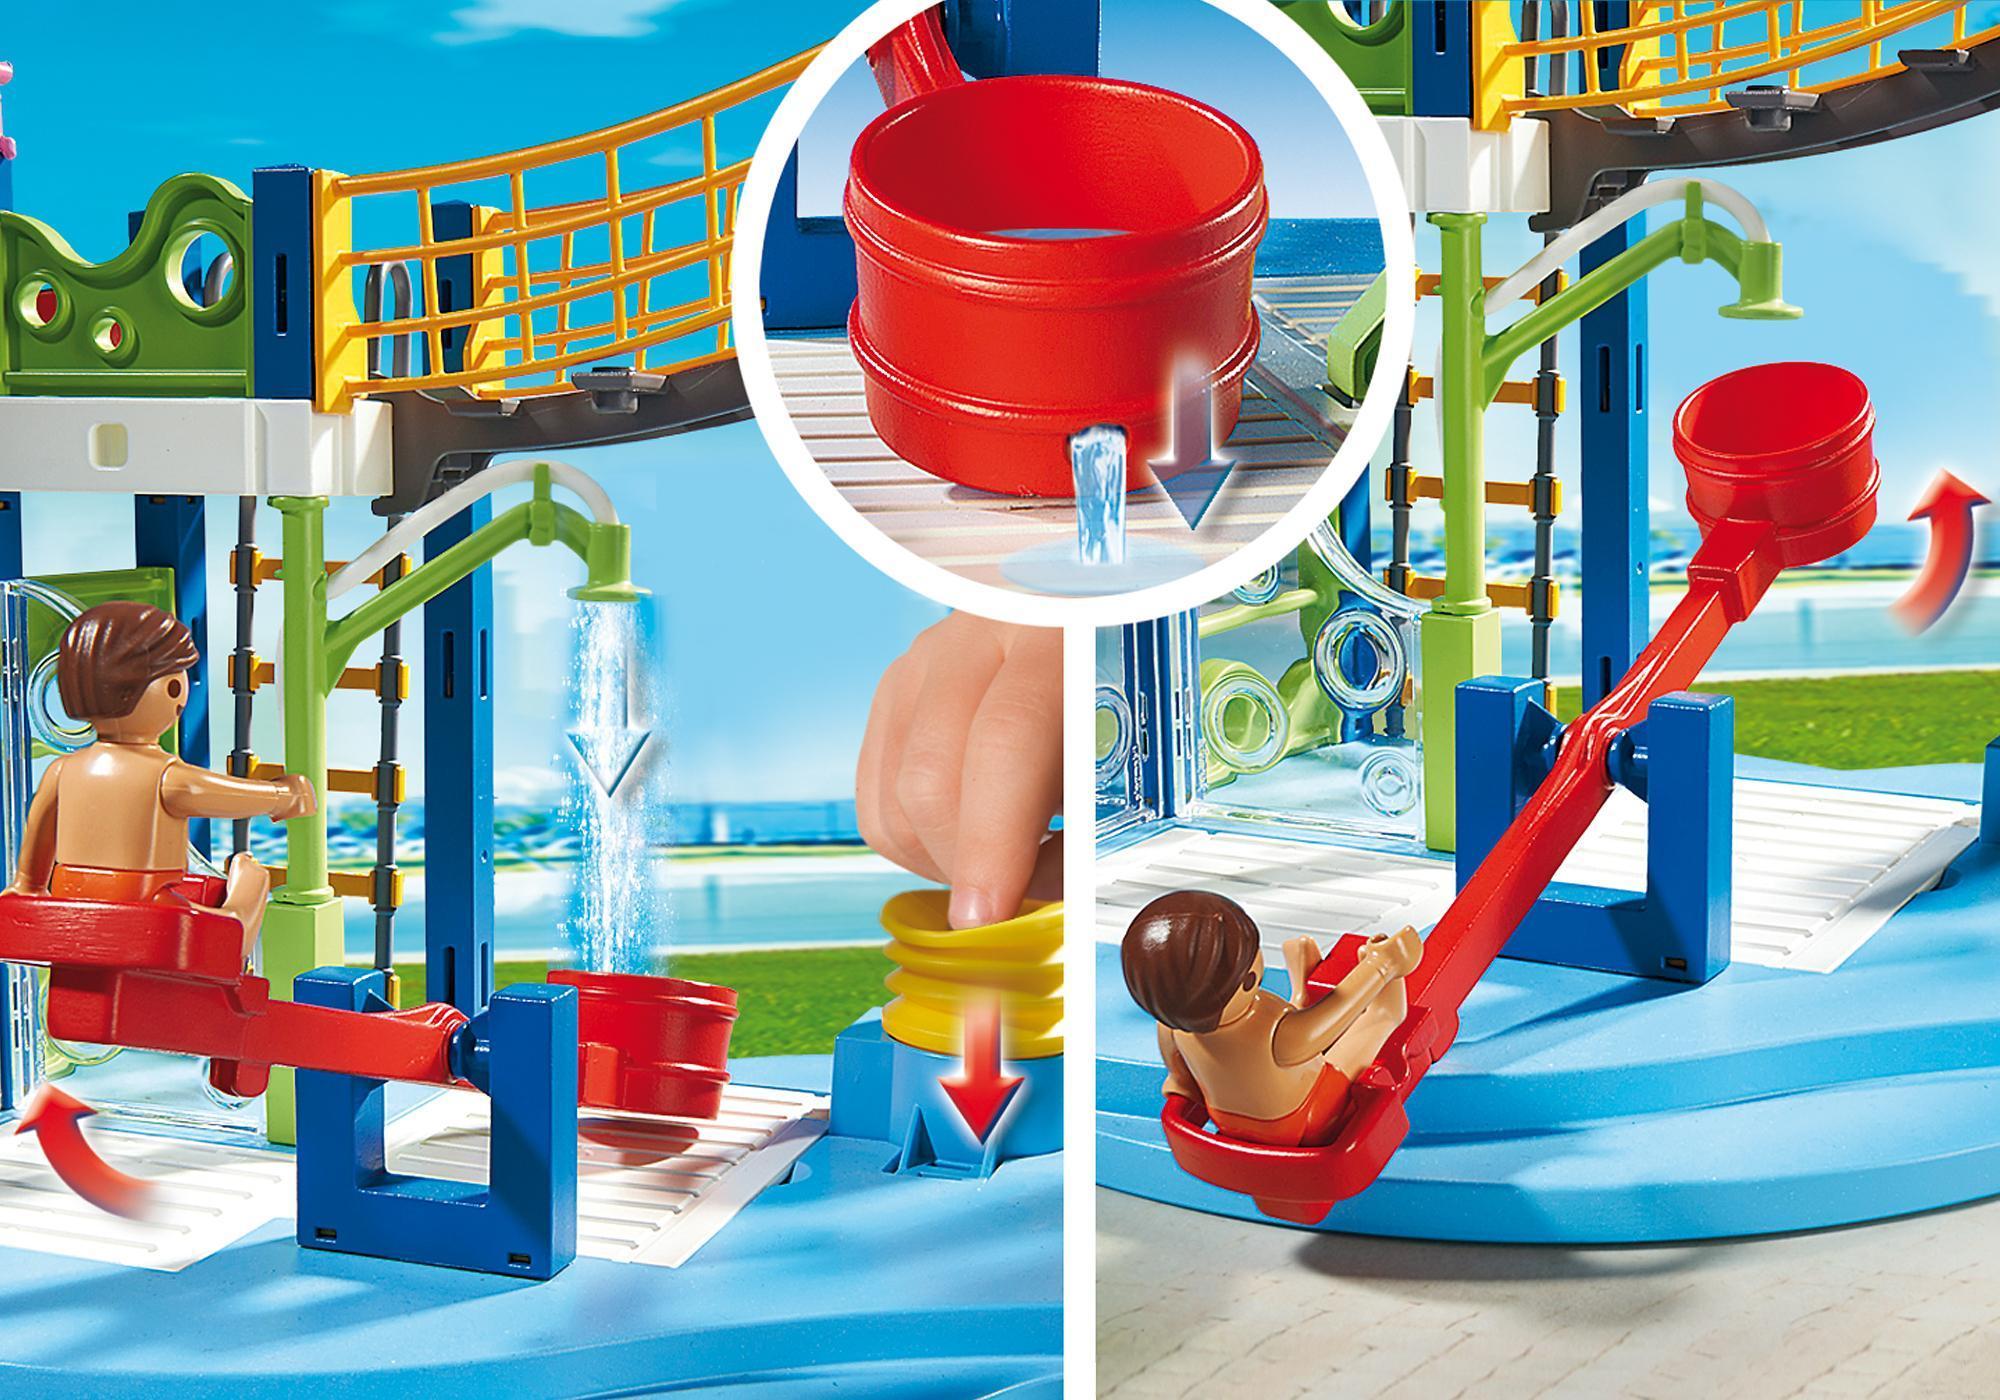 http://media.playmobil.com/i/playmobil/6670_product_extra1/Wasserspielplatz